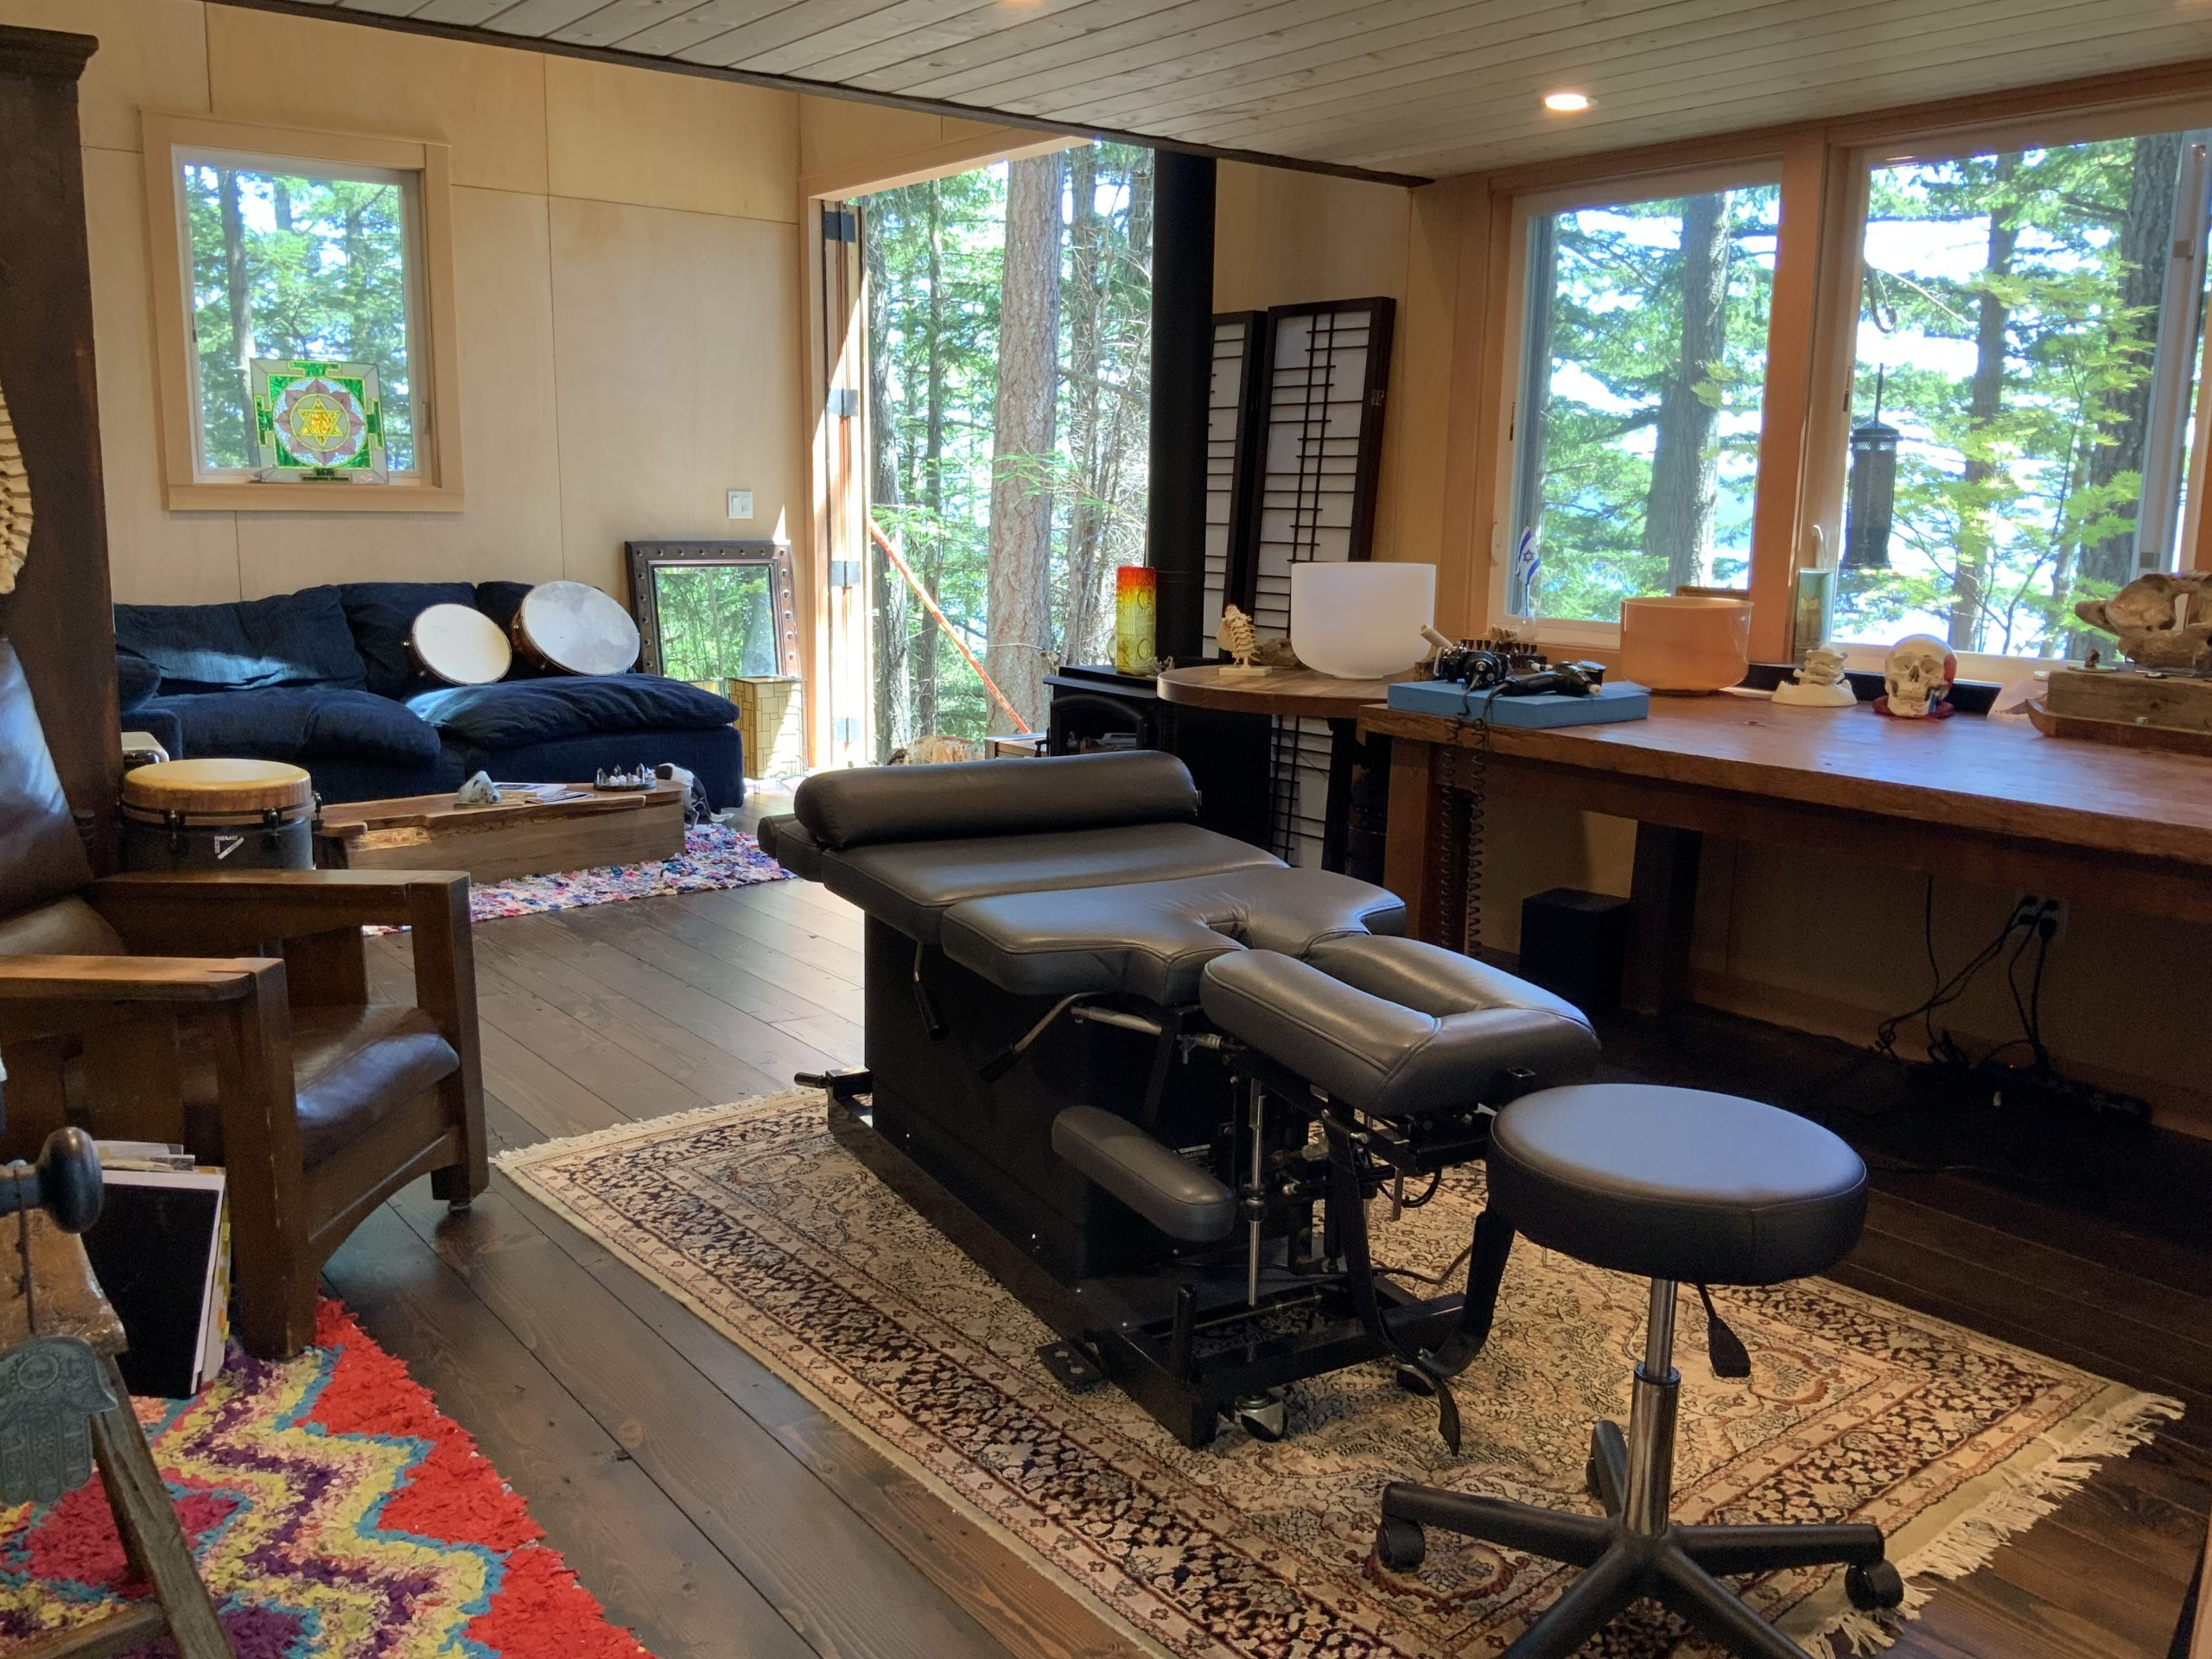 chiropractic cabin